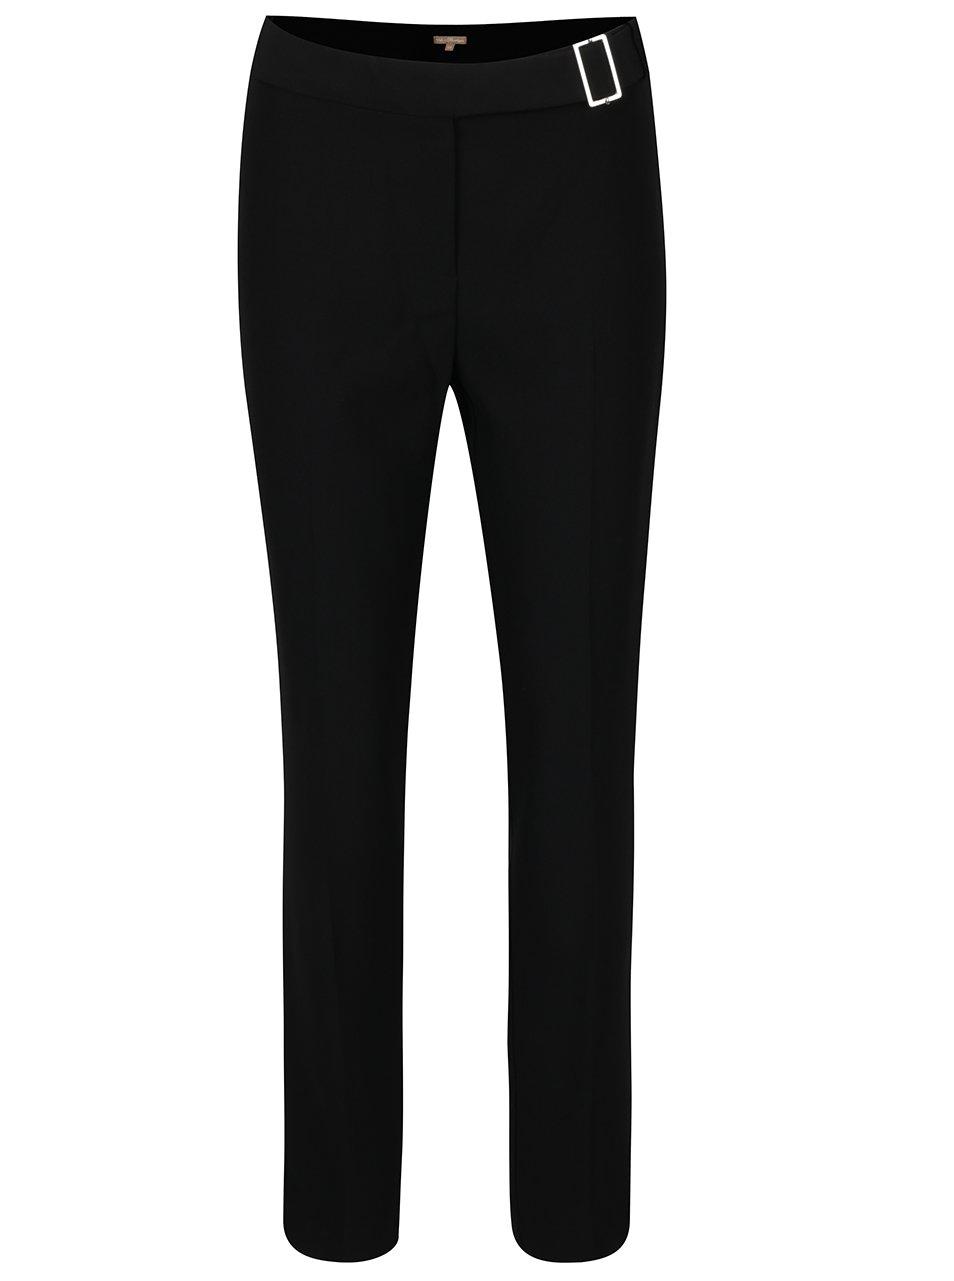 Čierne dámske formálne nohavice M&Co